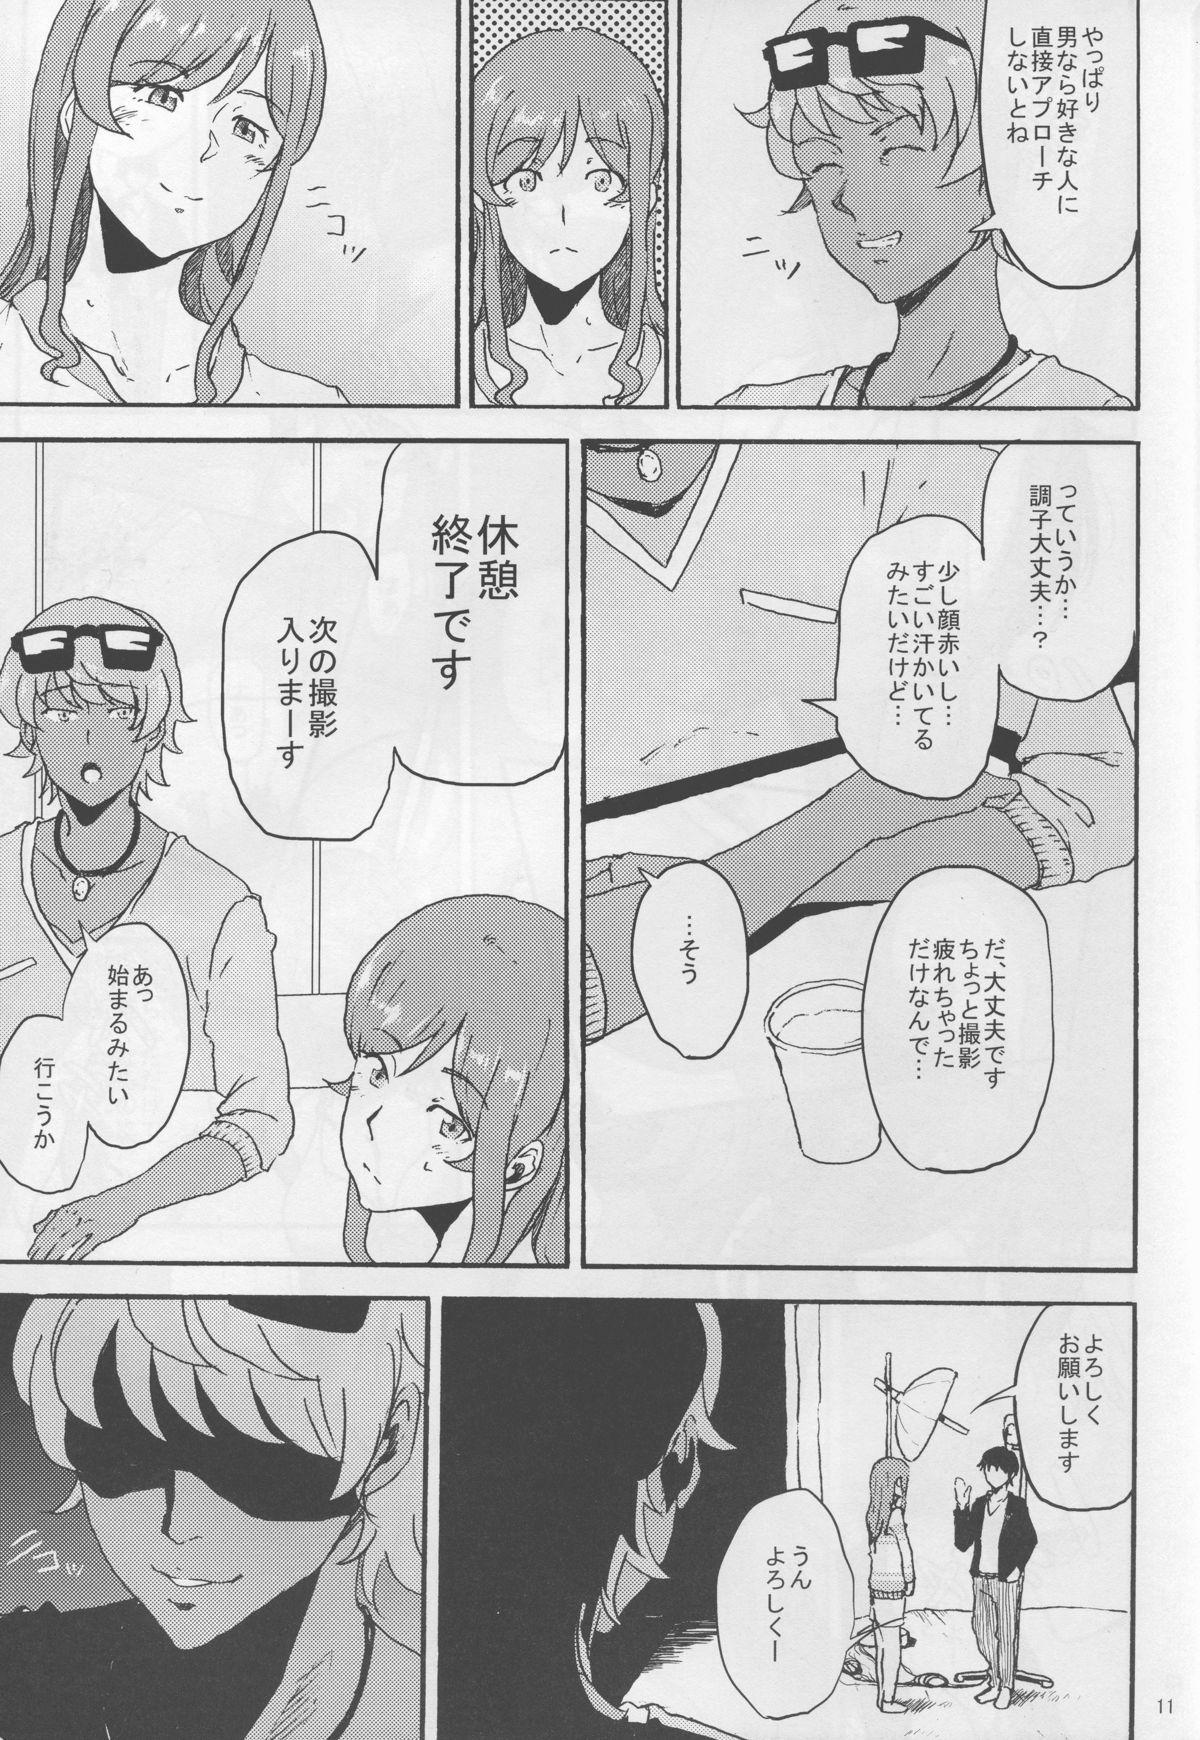 Mirai-chan ga Sandaime SGOCK no Leader ni Damasare Yarechau Hon 10